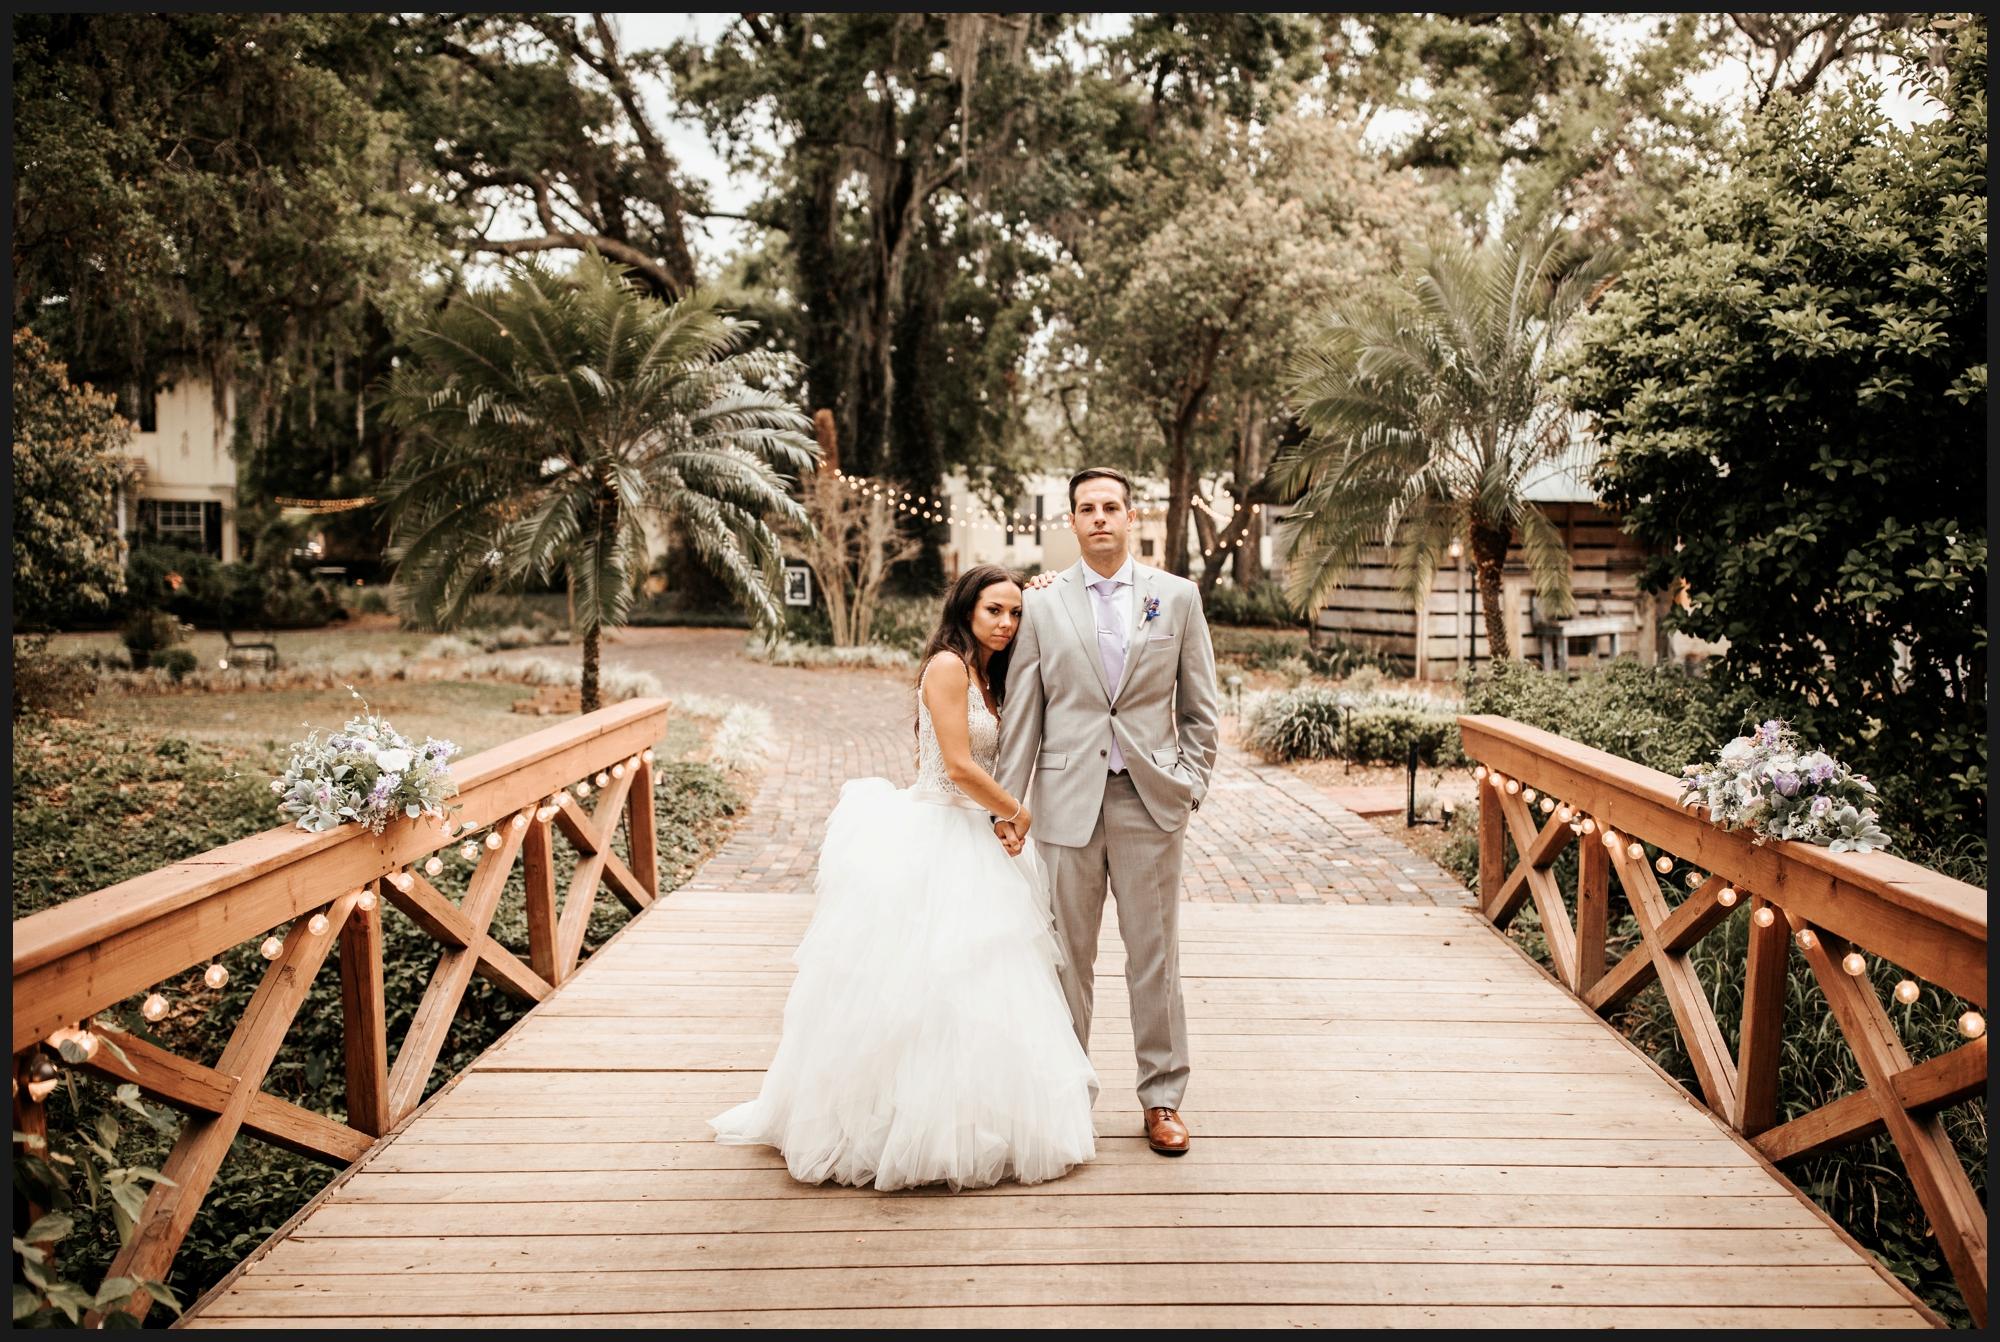 Orlando-Wedding-Photographer-destination-wedding-photographer-florida-wedding-photographer-bohemian-wedding-photographer_1641.jpg